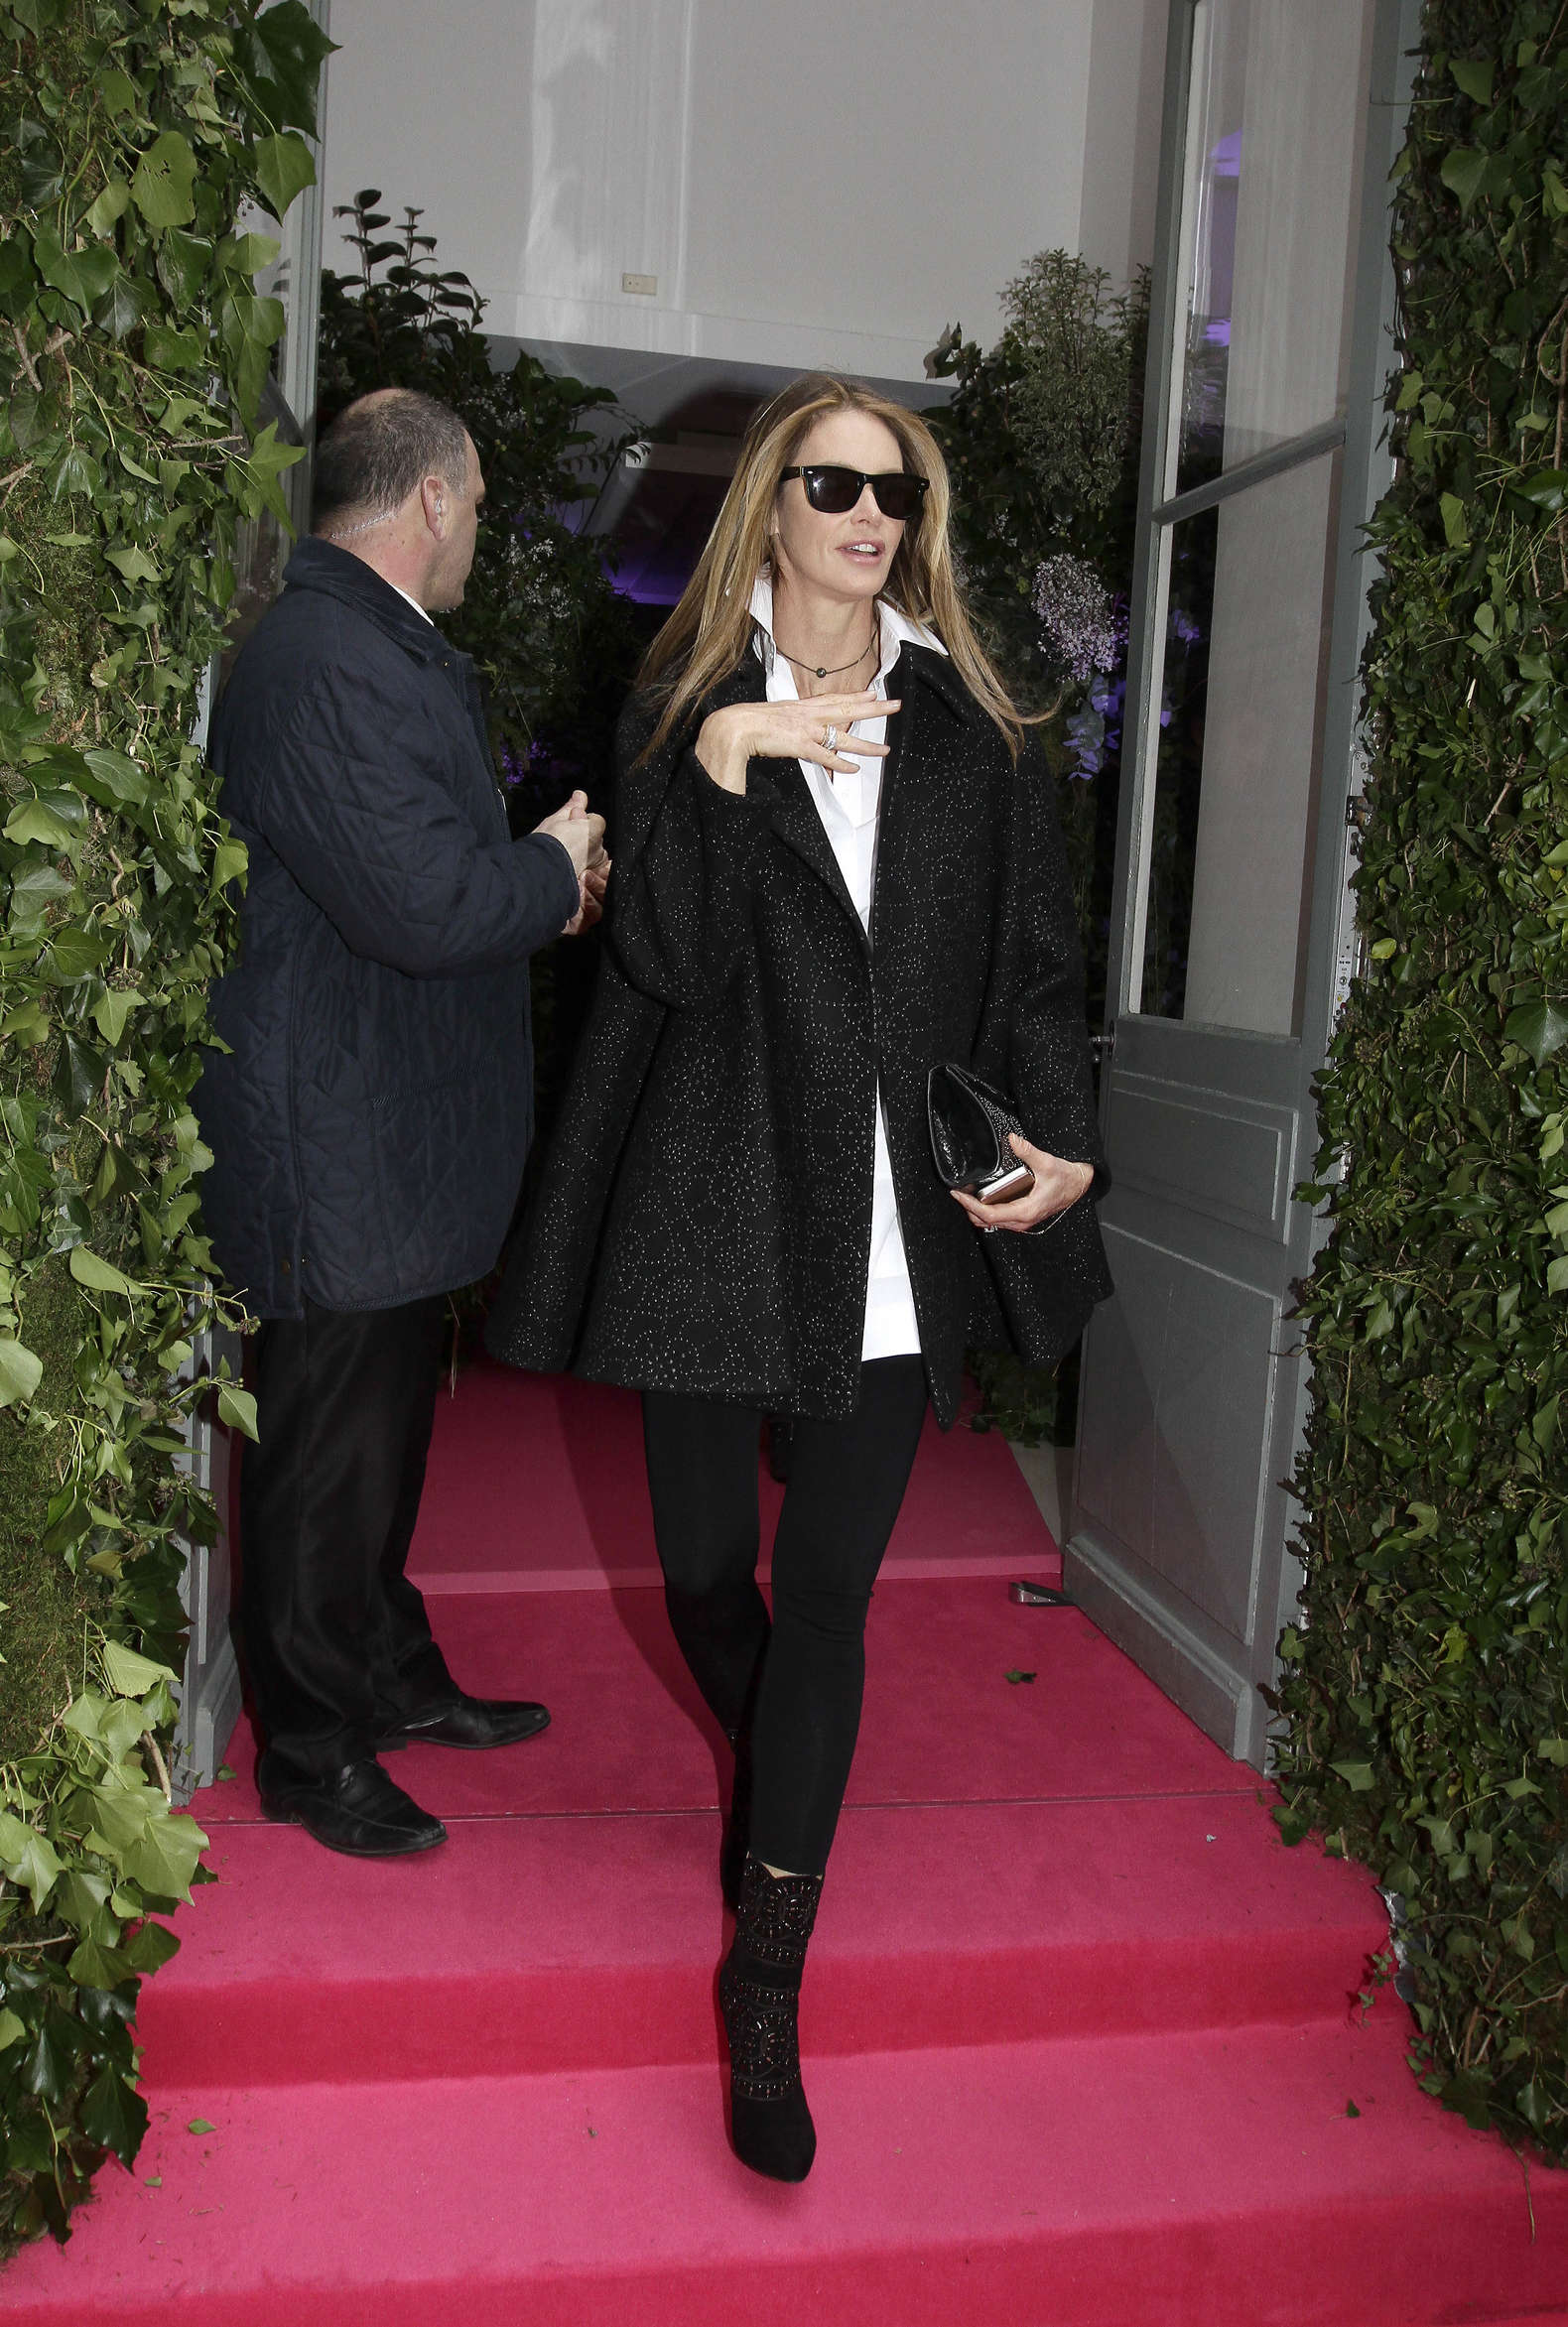 Elle macpherson 2014 fashion show in paris 02 gotceleb Good style fashion show cleveland 2014